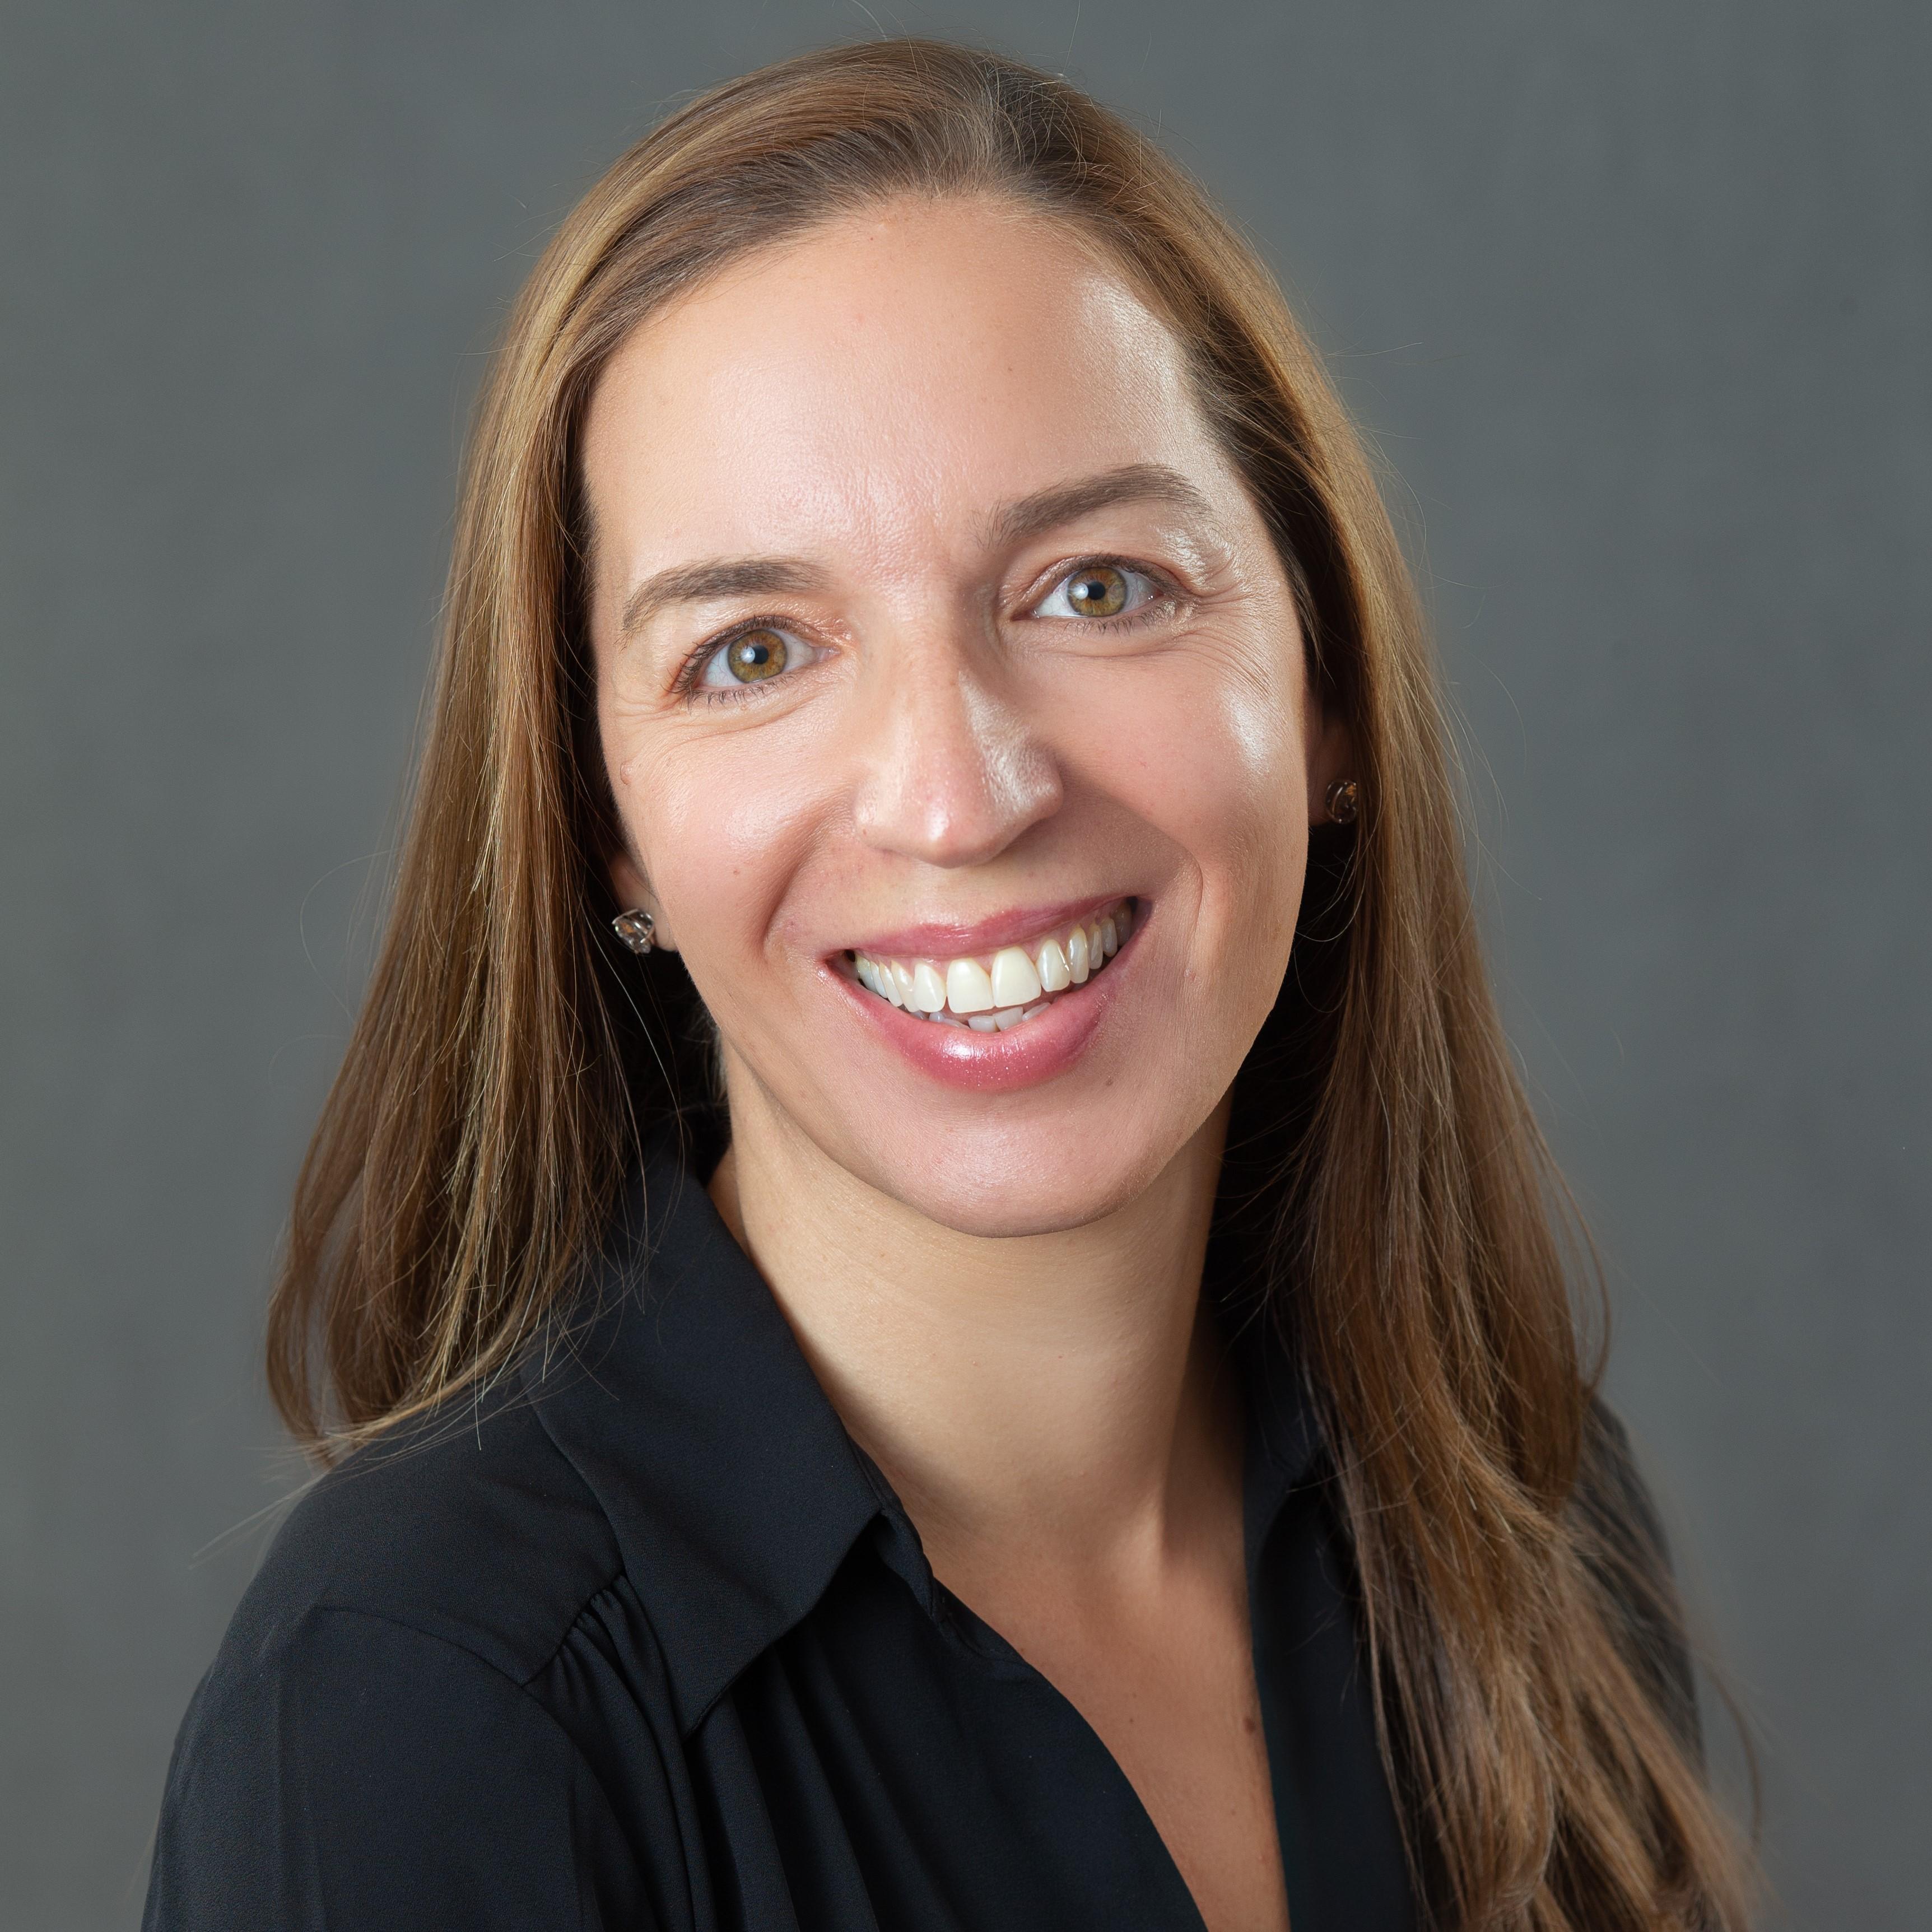 Dina Loomis - Staff Accountant